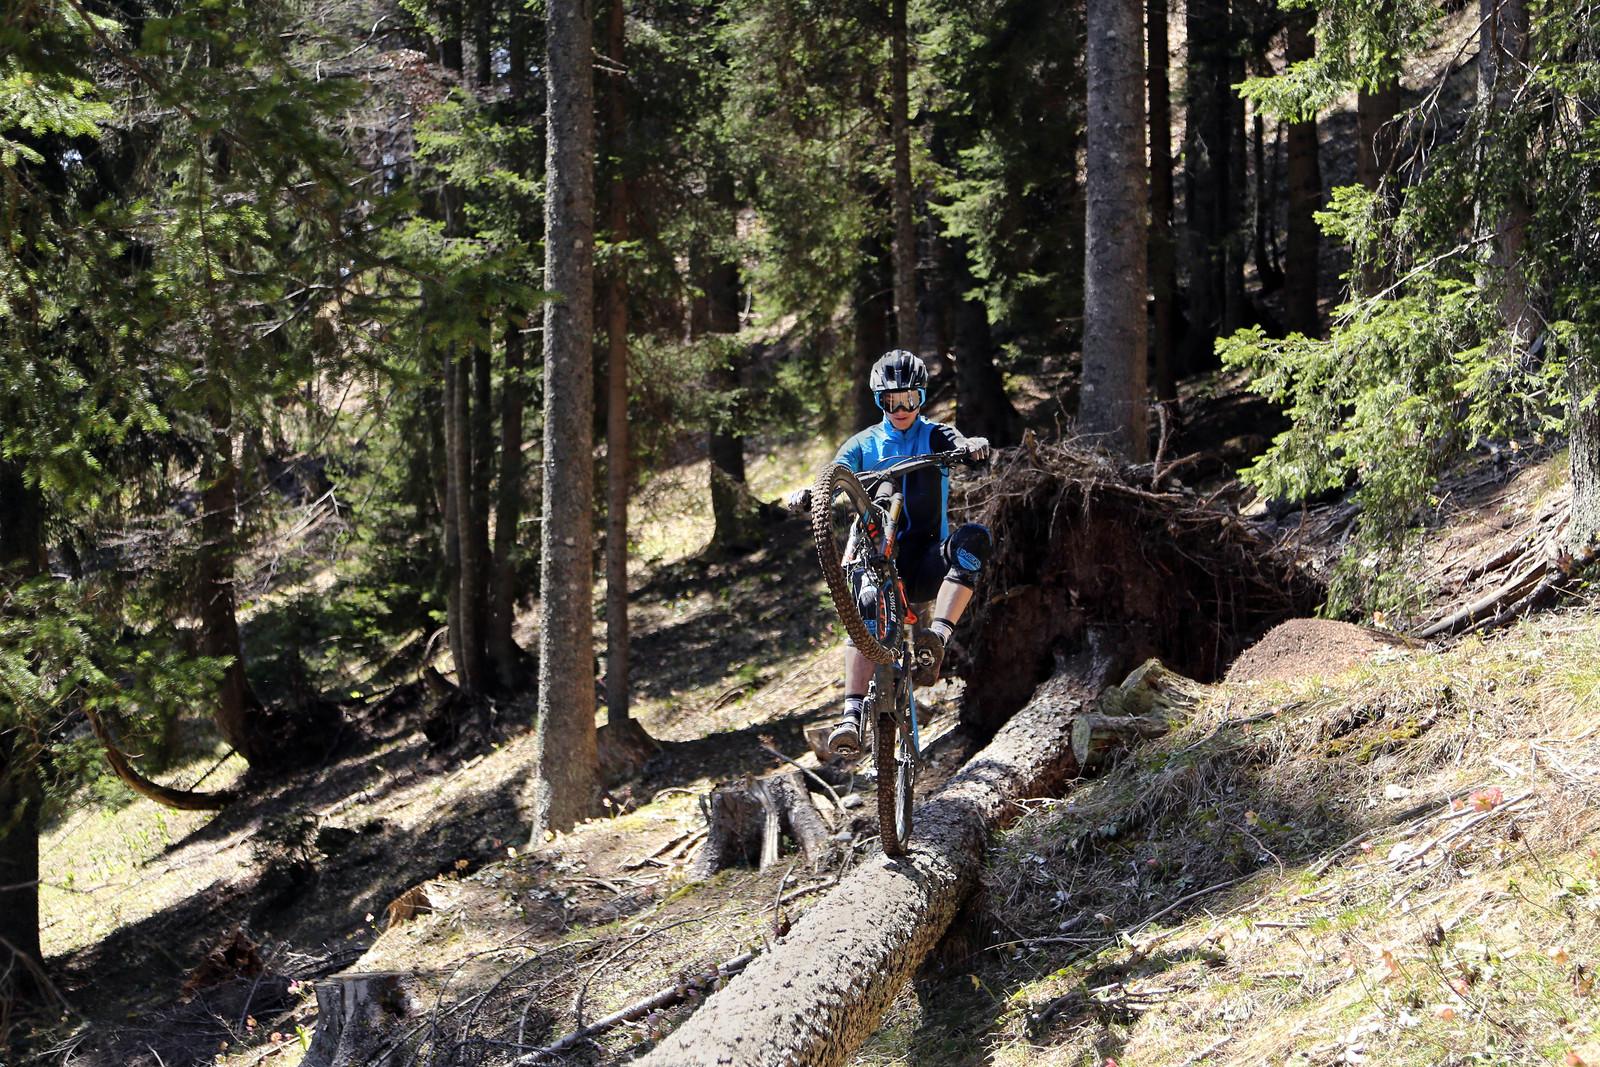 Vid Peršak skills - porson - Mountain Biking Pictures - Vital MTB